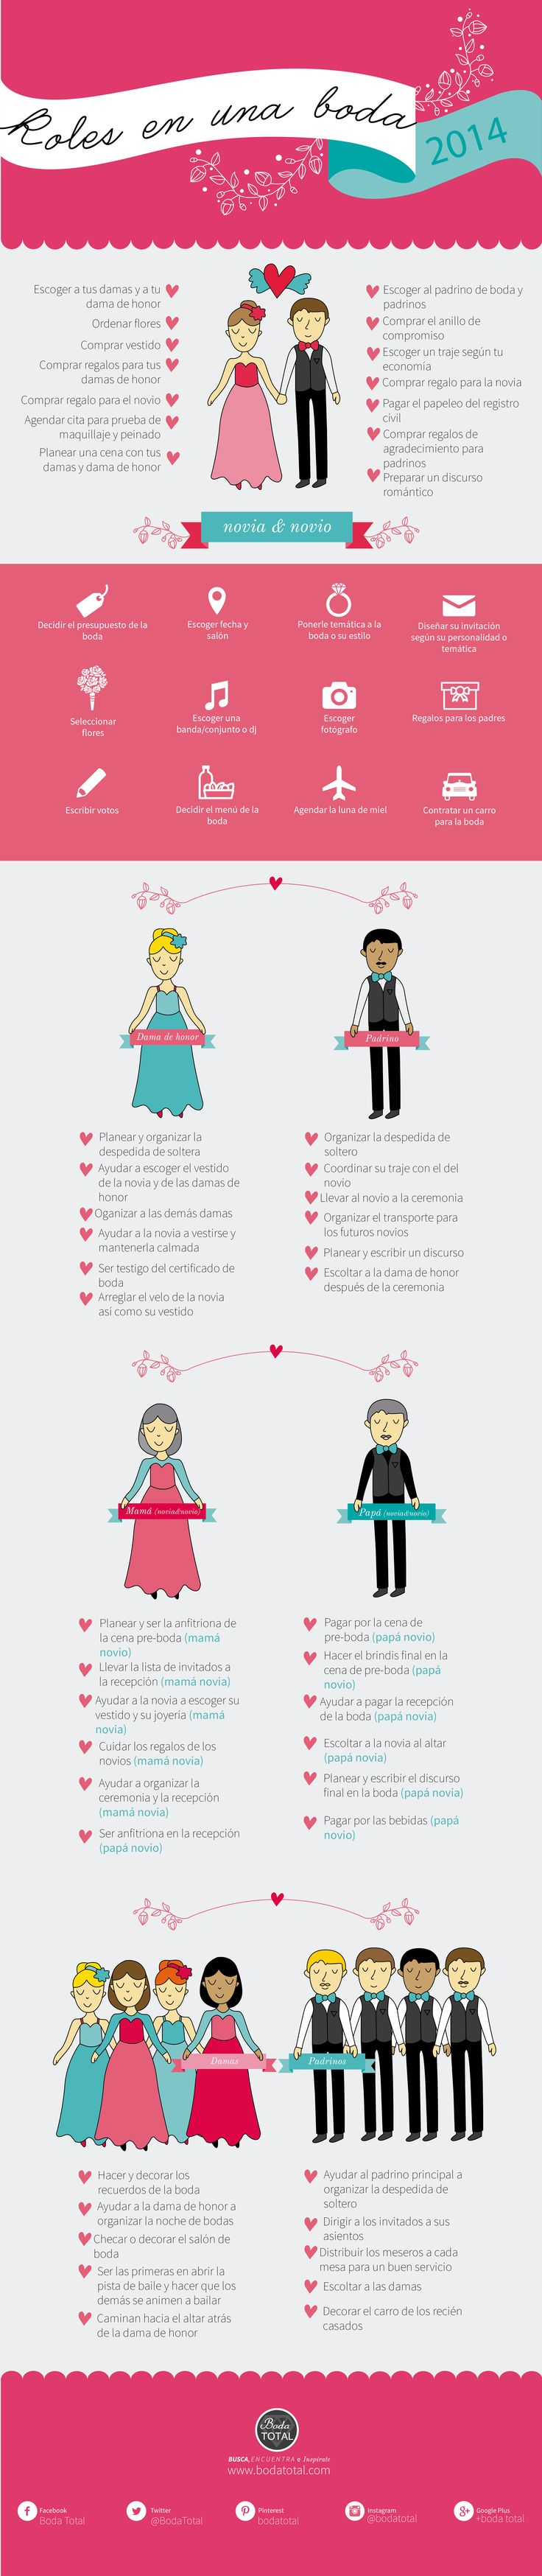 La interminable guerra entre sexos. ¿Ya sabes que te toca cuando se trata de una boda? #BodaTotalTips #boda #infografia #novios